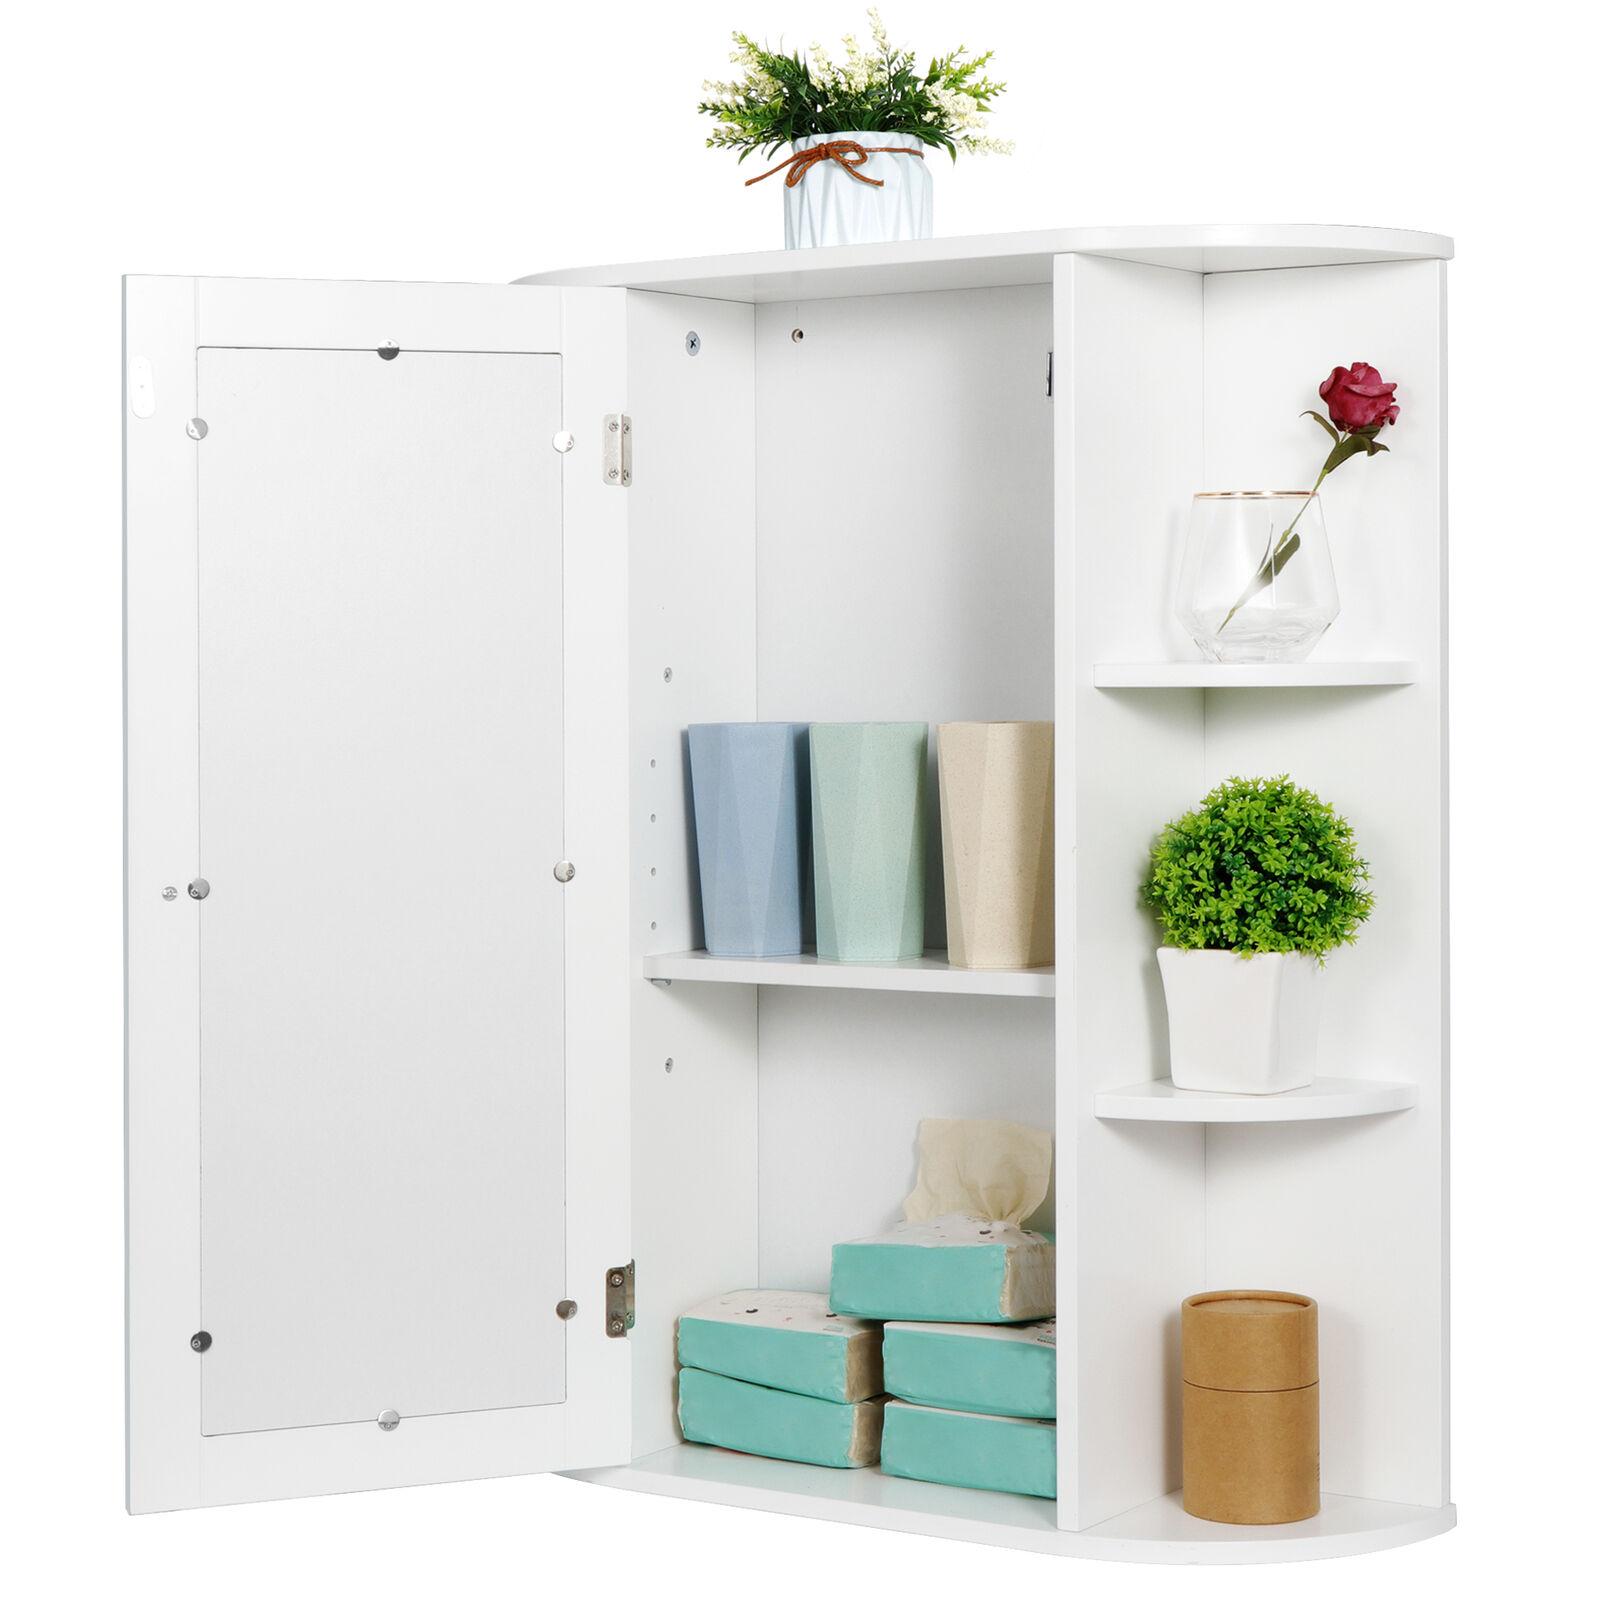 Modern Bathroom Cabinet Storage Organizer Single Door Wall Mount with Mirror Bath